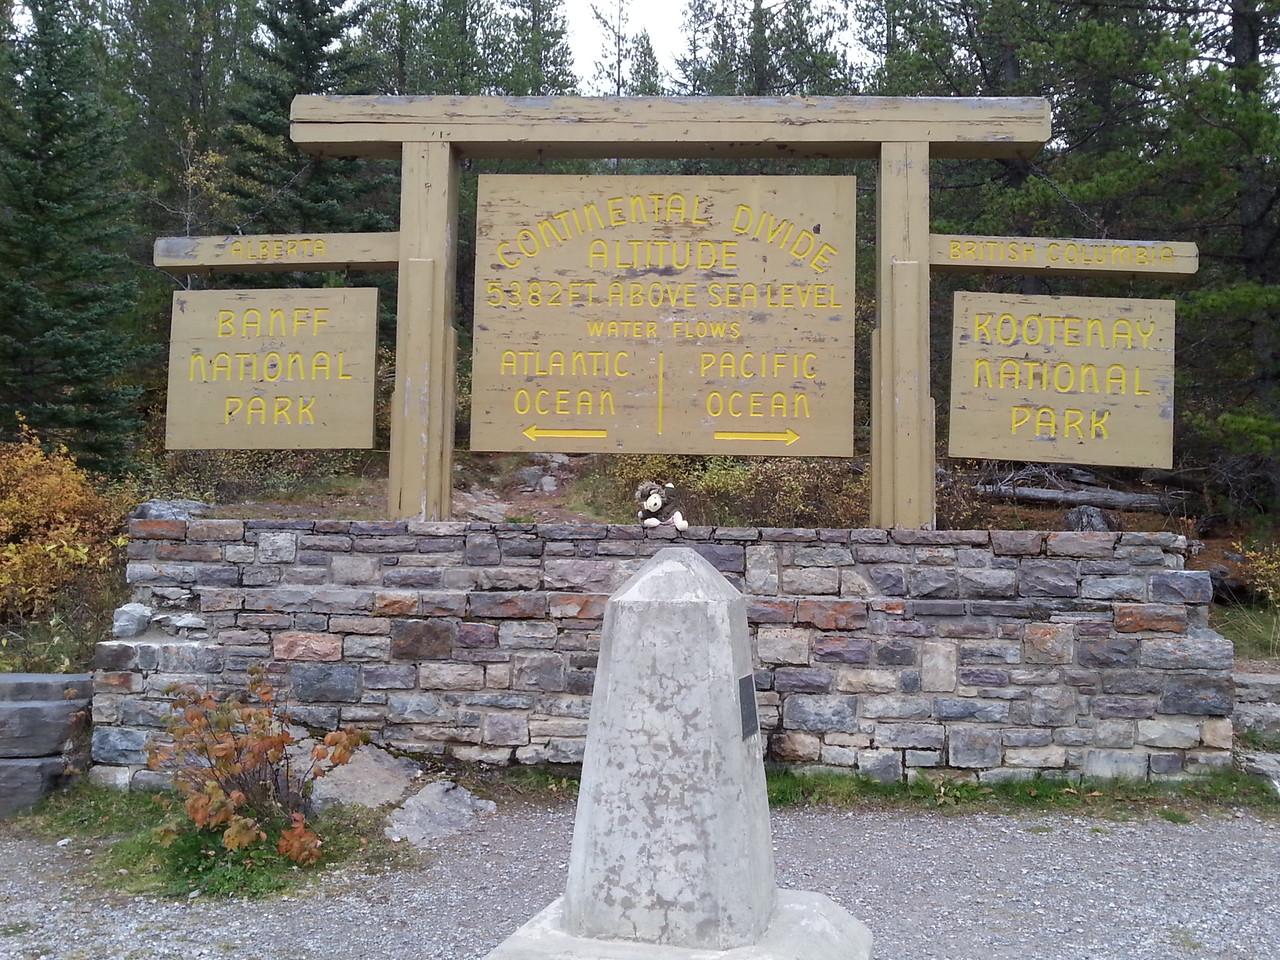 Continental Divide Canadian Rockies